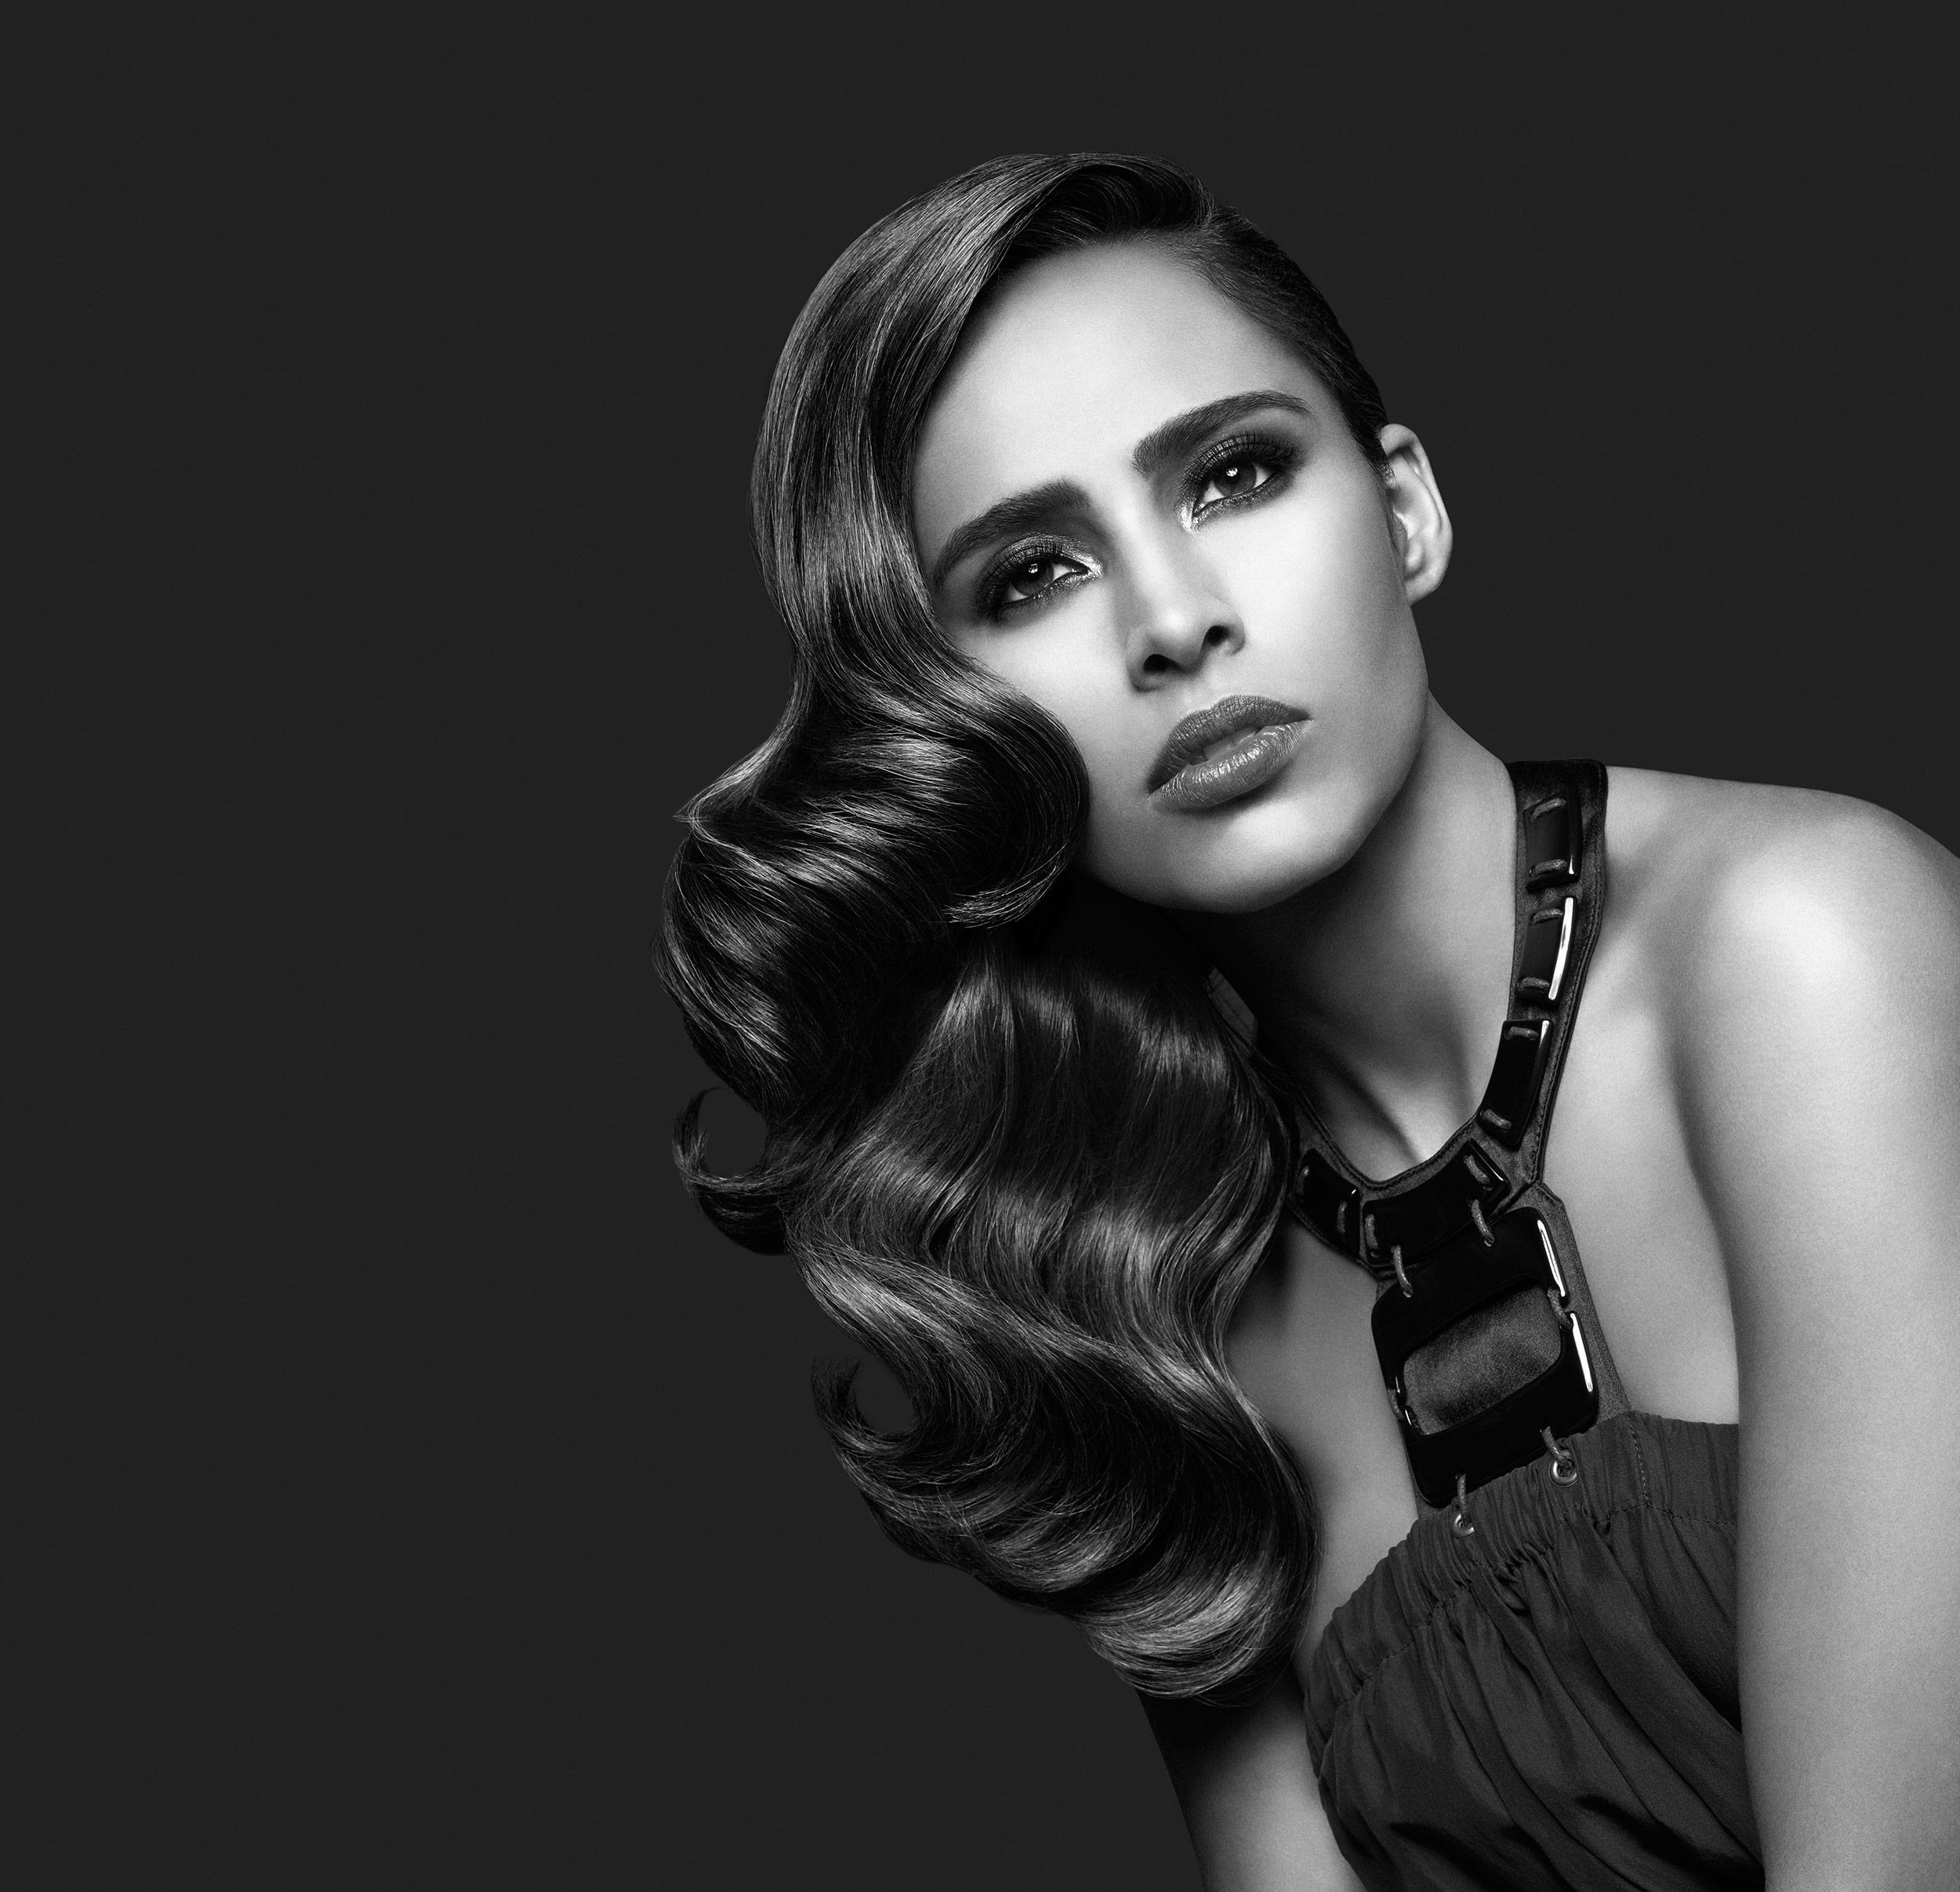 Awapuhi-model-Adriana3-hq